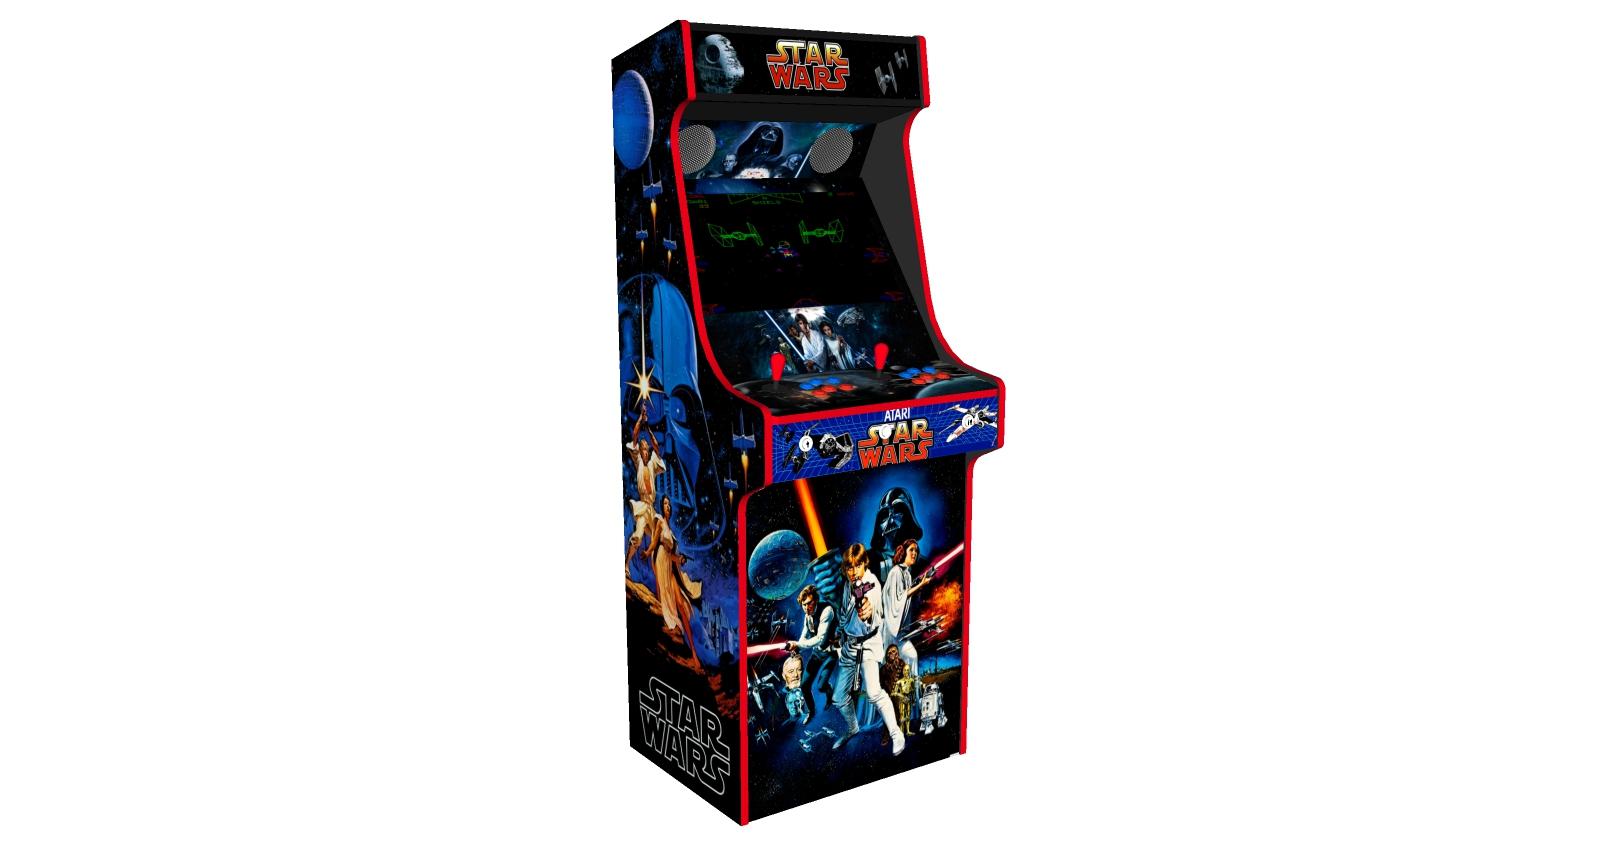 Classic Upright Arcade Machine - Star Wars v3 - Left